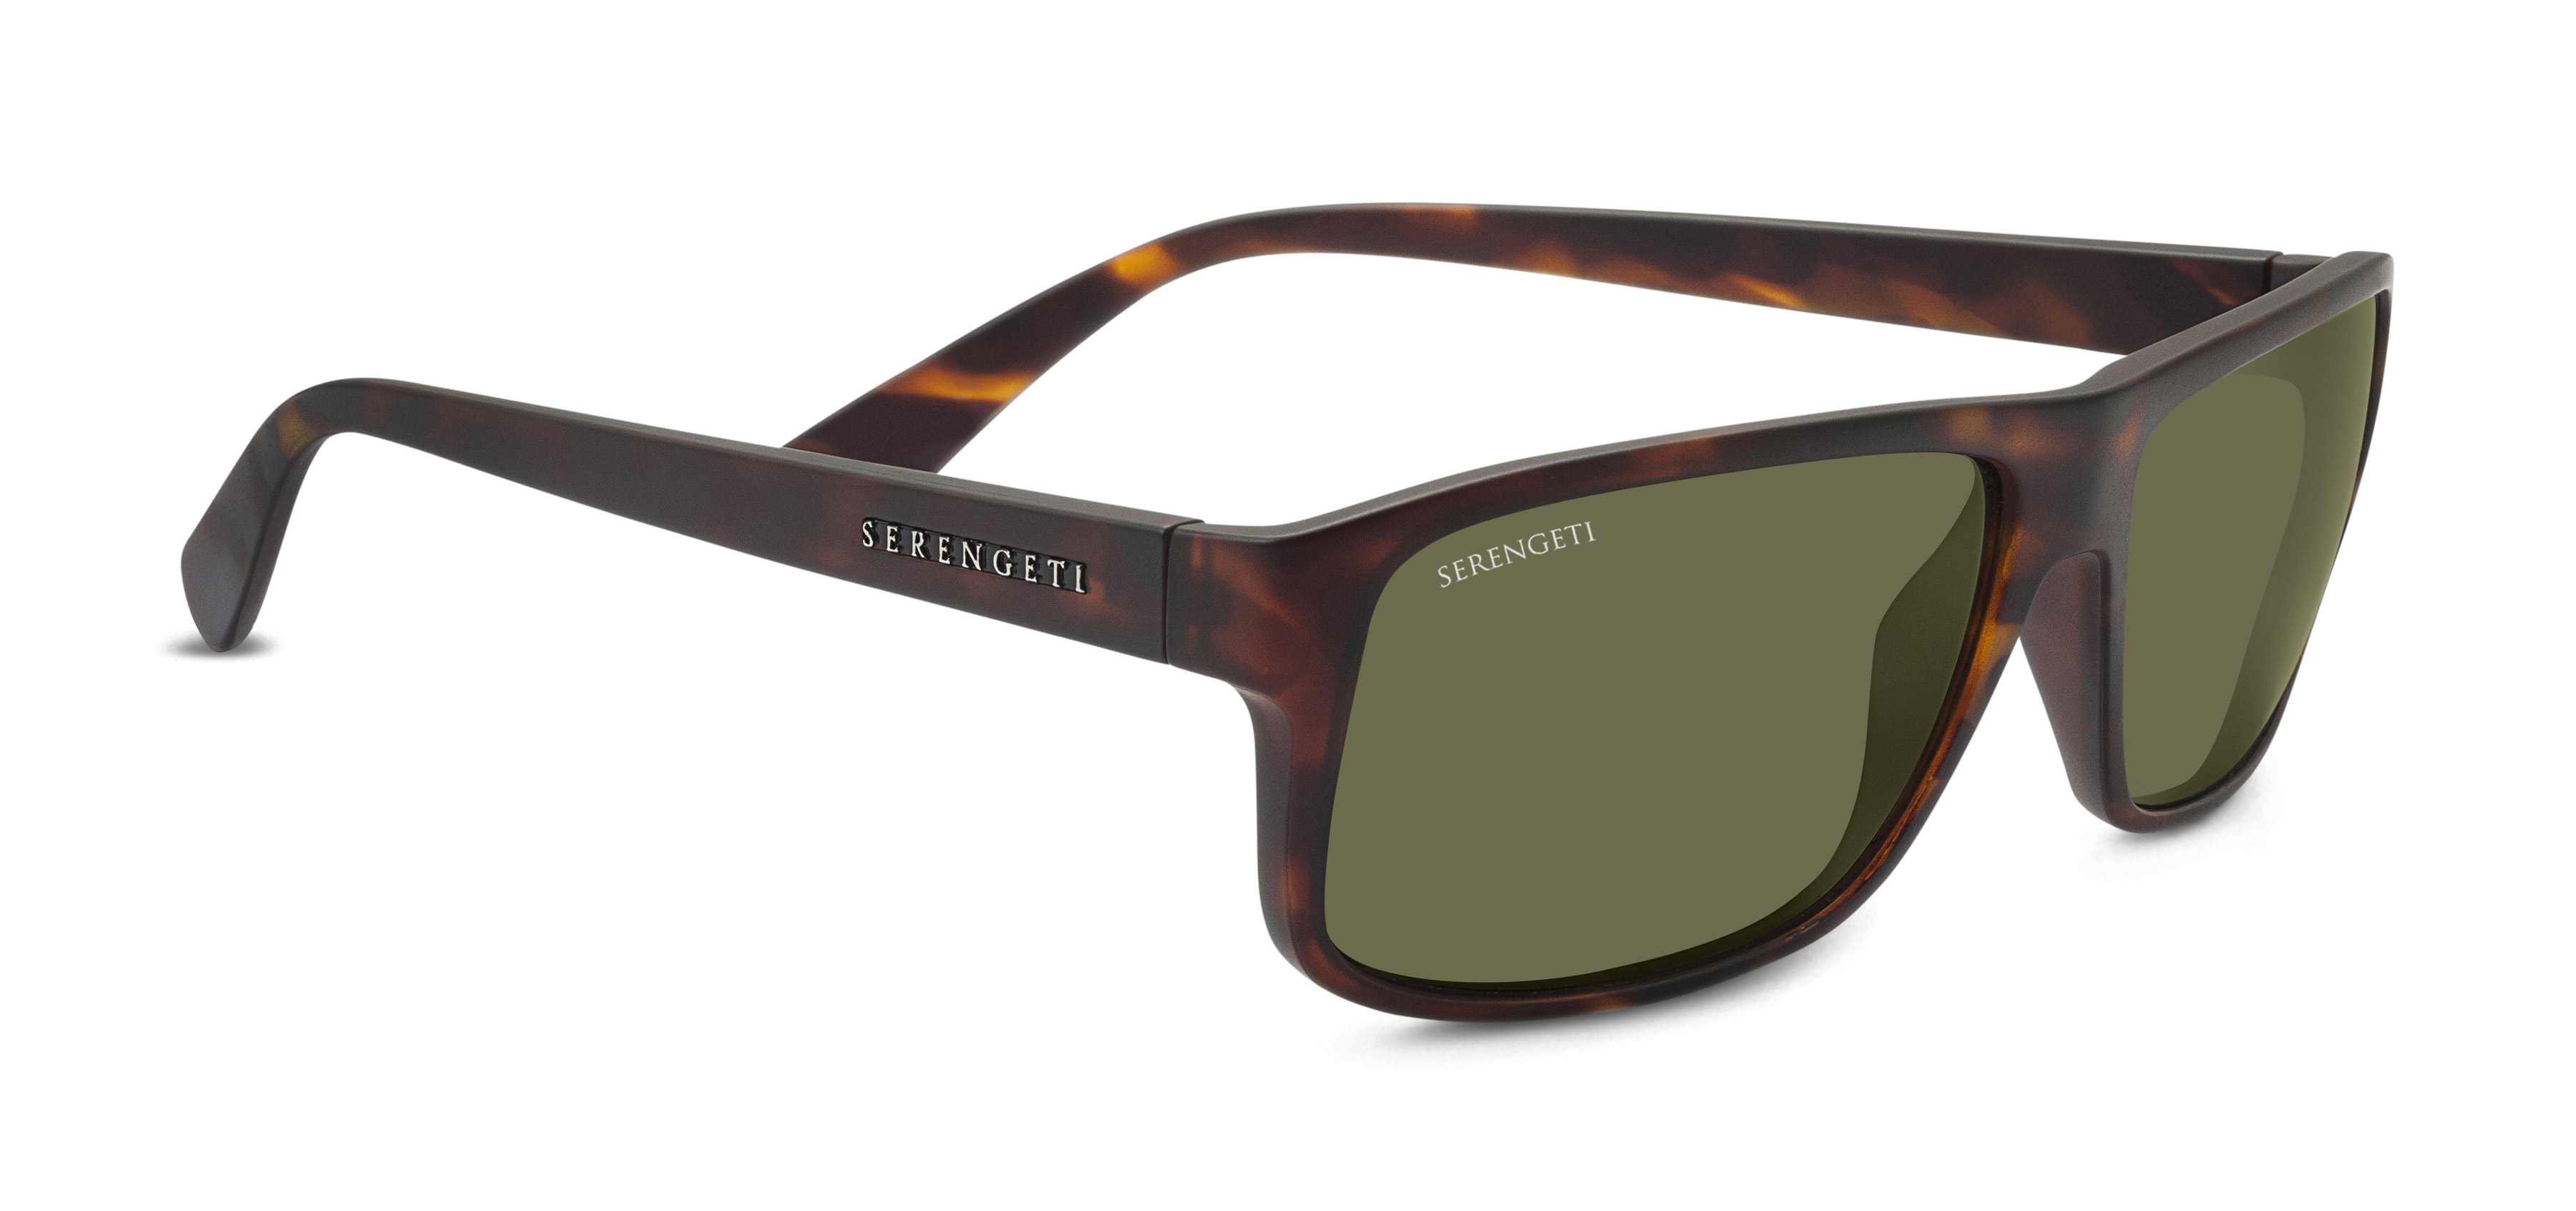 d0ecd399a78 Serengeti Claudio Sunglasses w  Free Shipping — 7 models